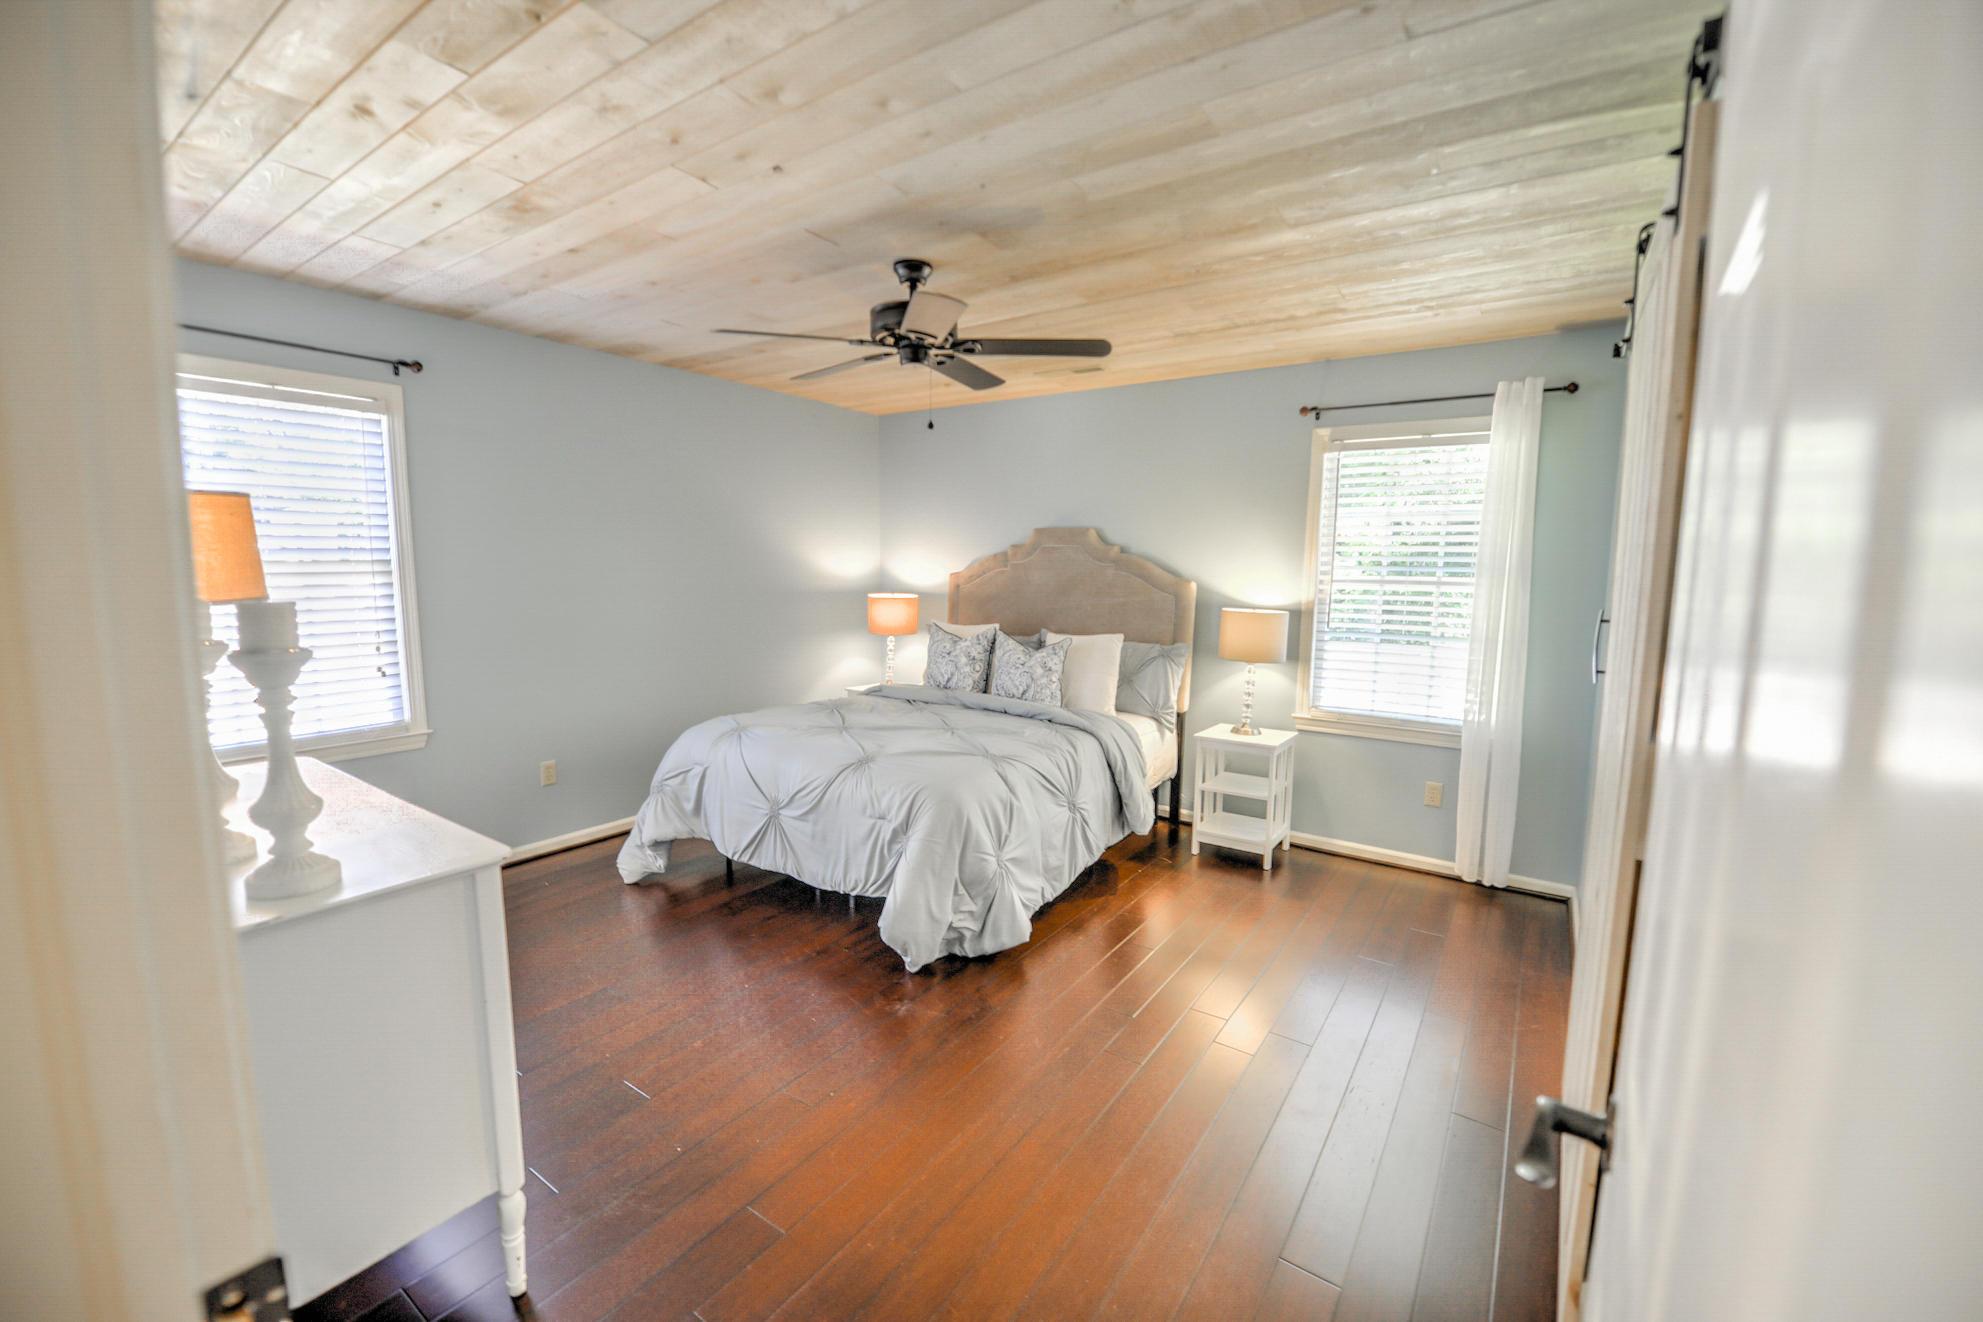 Shemwood II Homes For Sale - 1017 Jack Snipe, Mount Pleasant, SC - 4